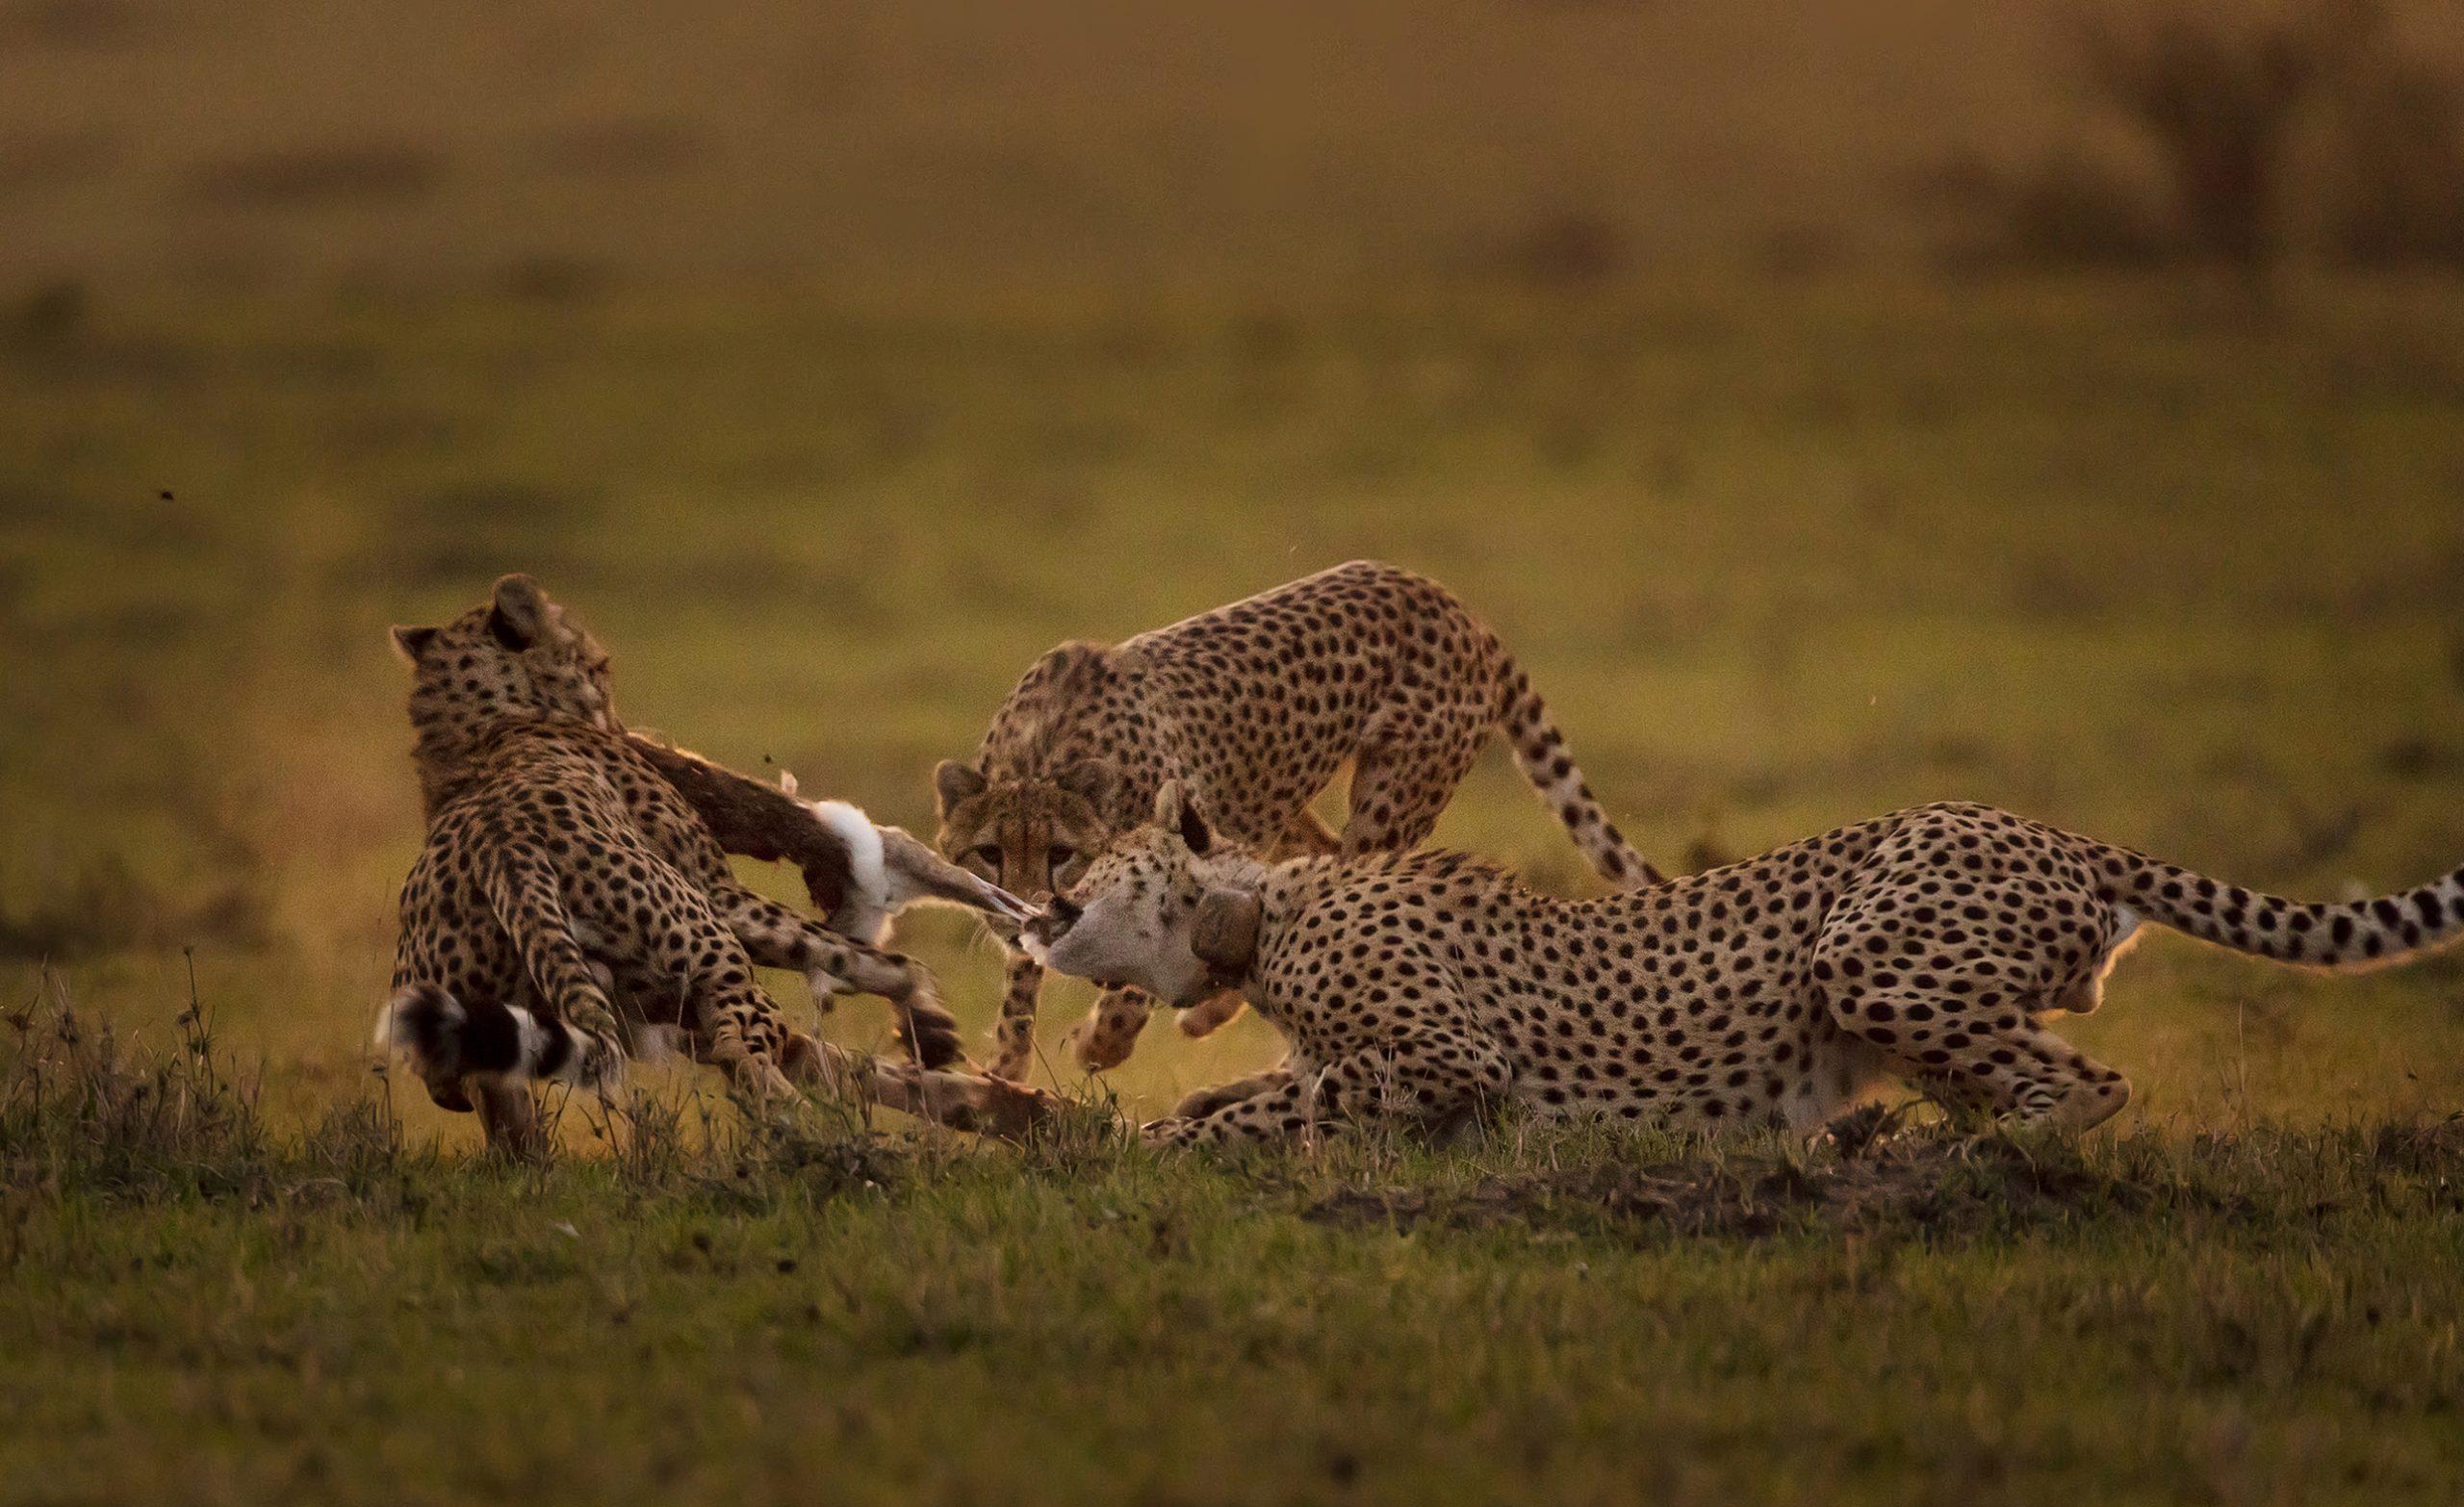 cheetahs tear apart a rabbit after hunting in Maasai Mara on a ClementWild Photo Safari